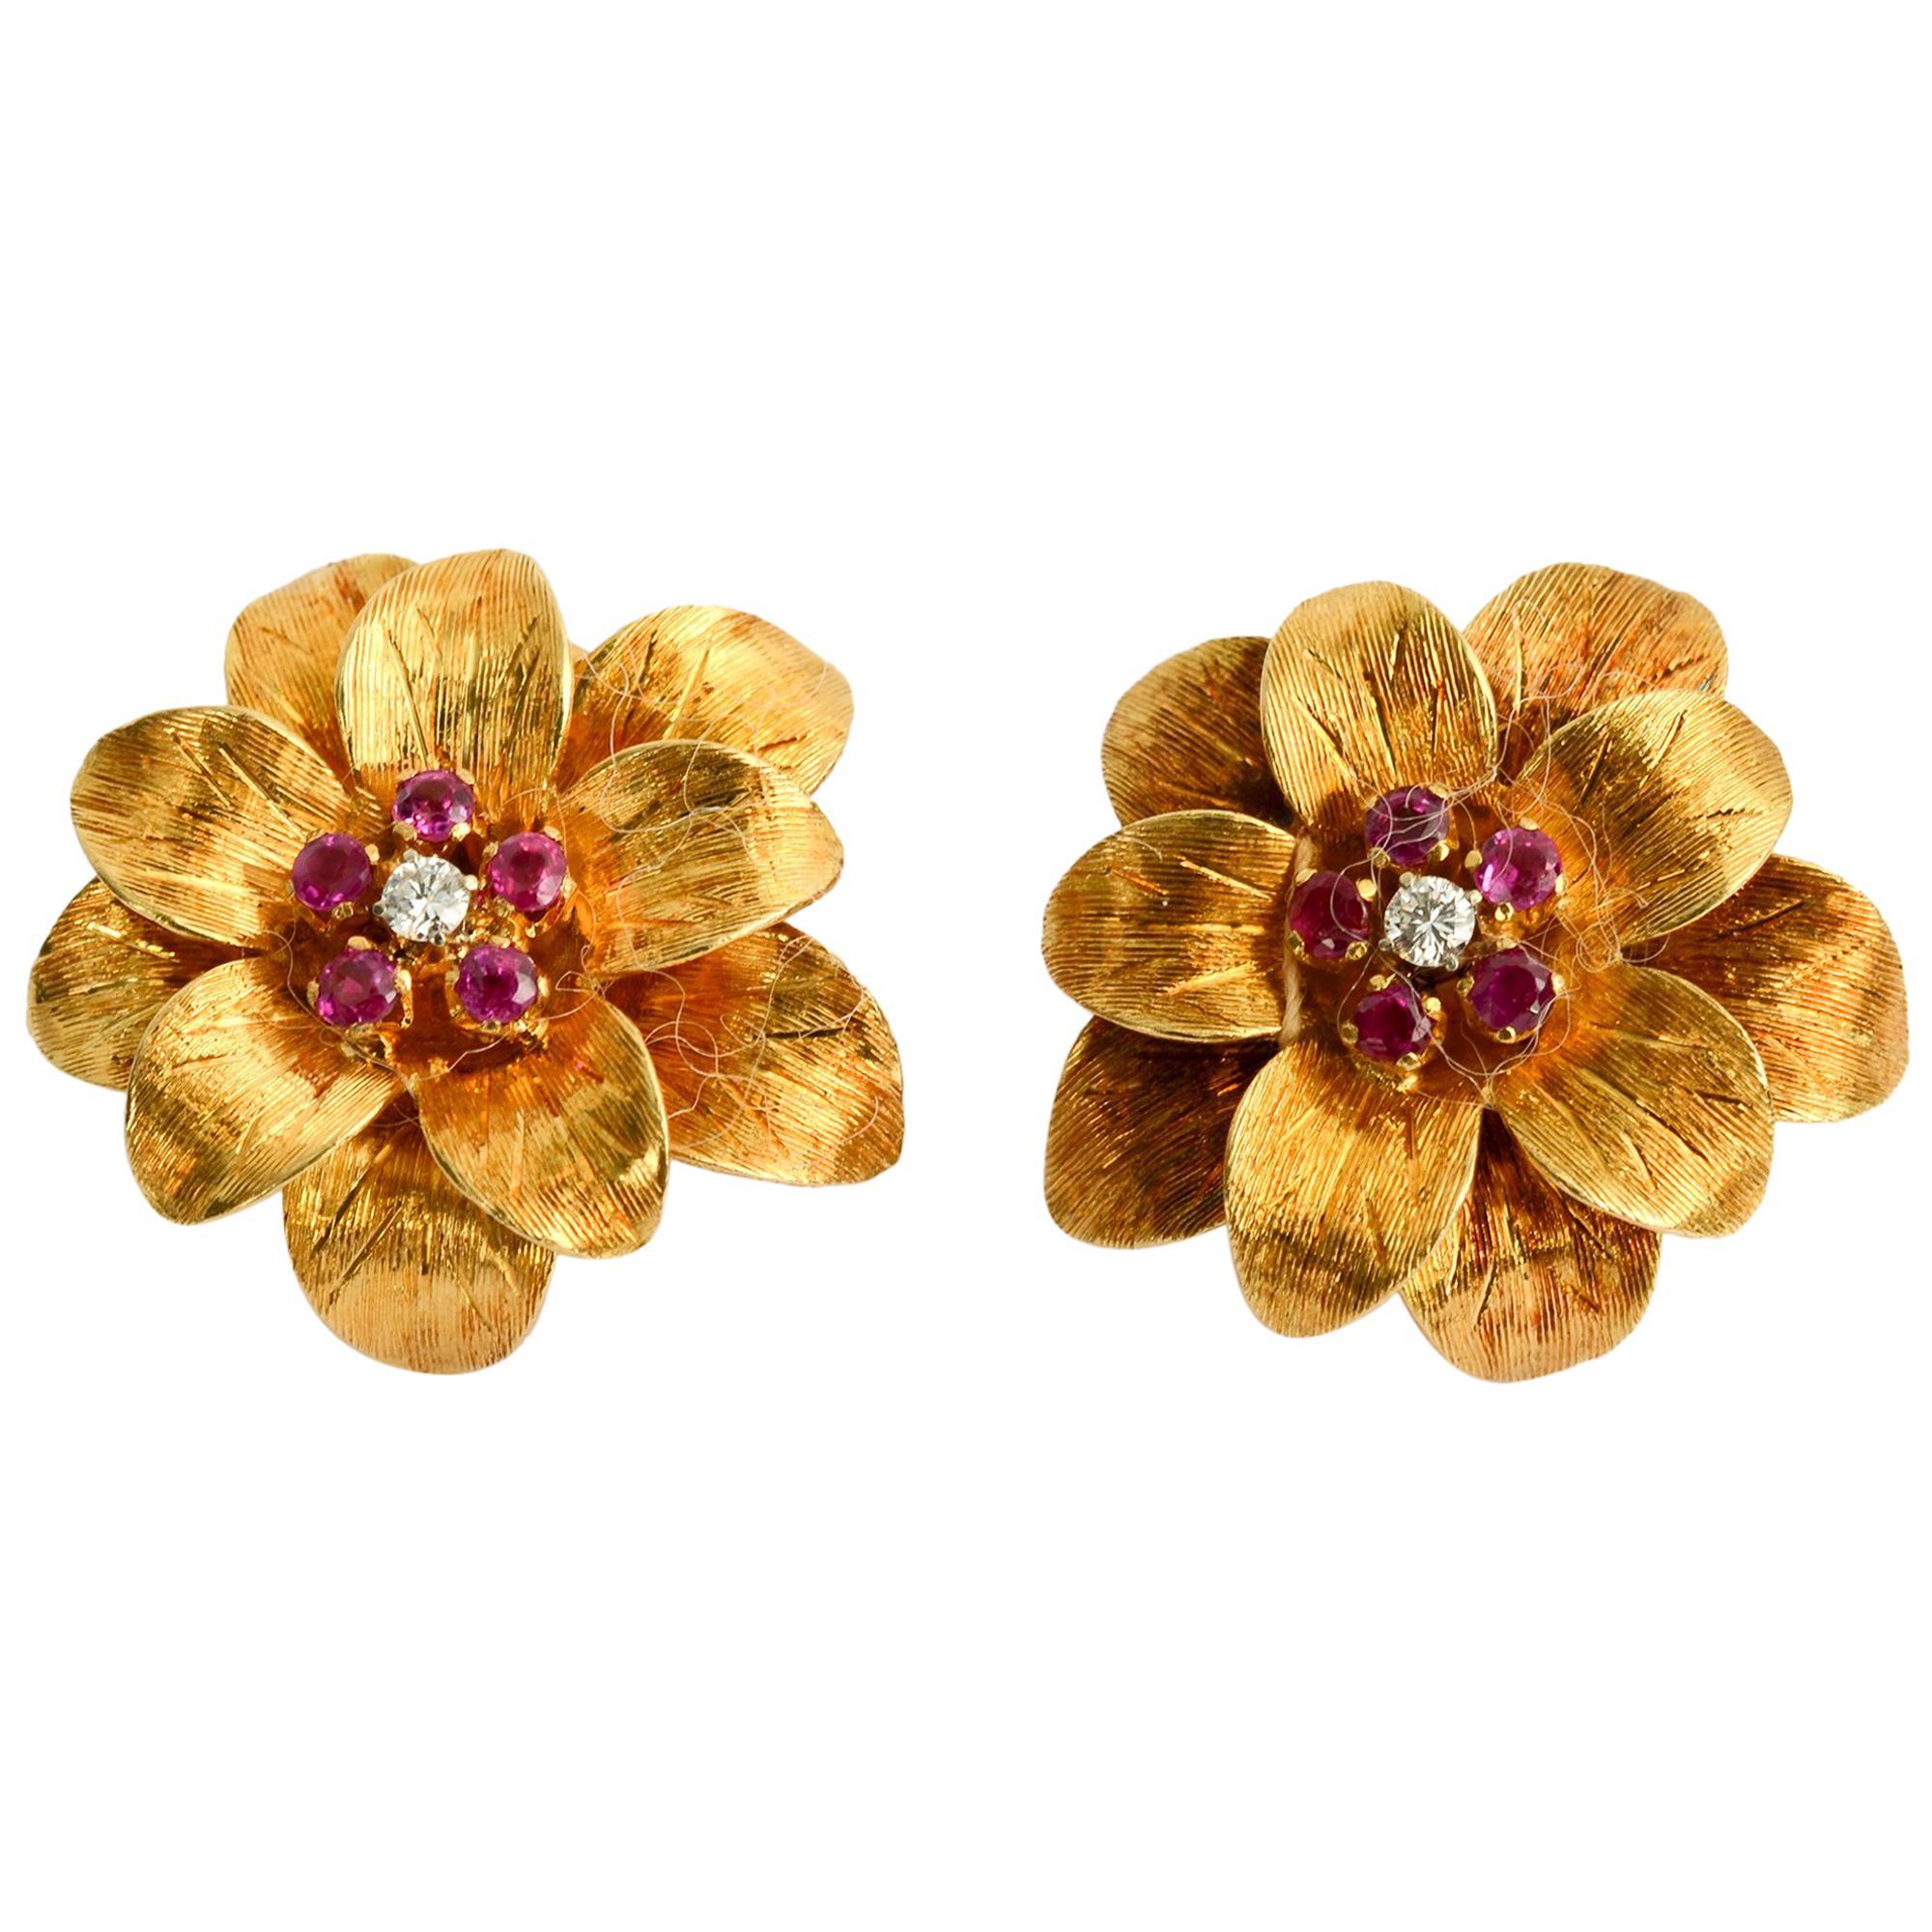 Tiffany & Co. Ruby and Diamond Flower Earrings